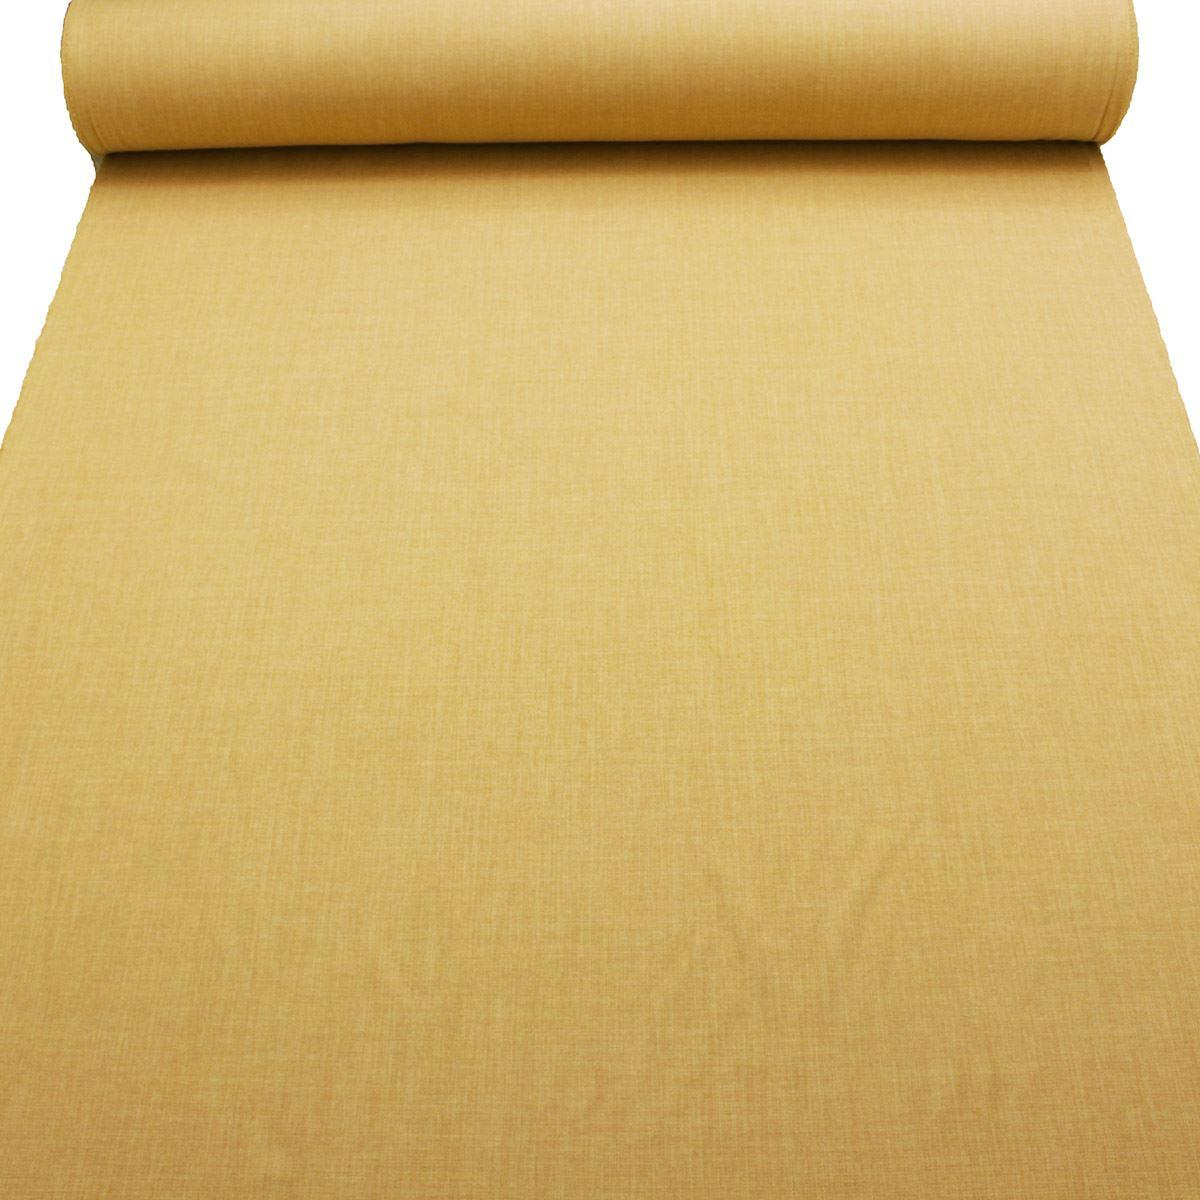 soft sofa material burbank charcoal grey waffle suede sectional plain linen look designer curtain cushion